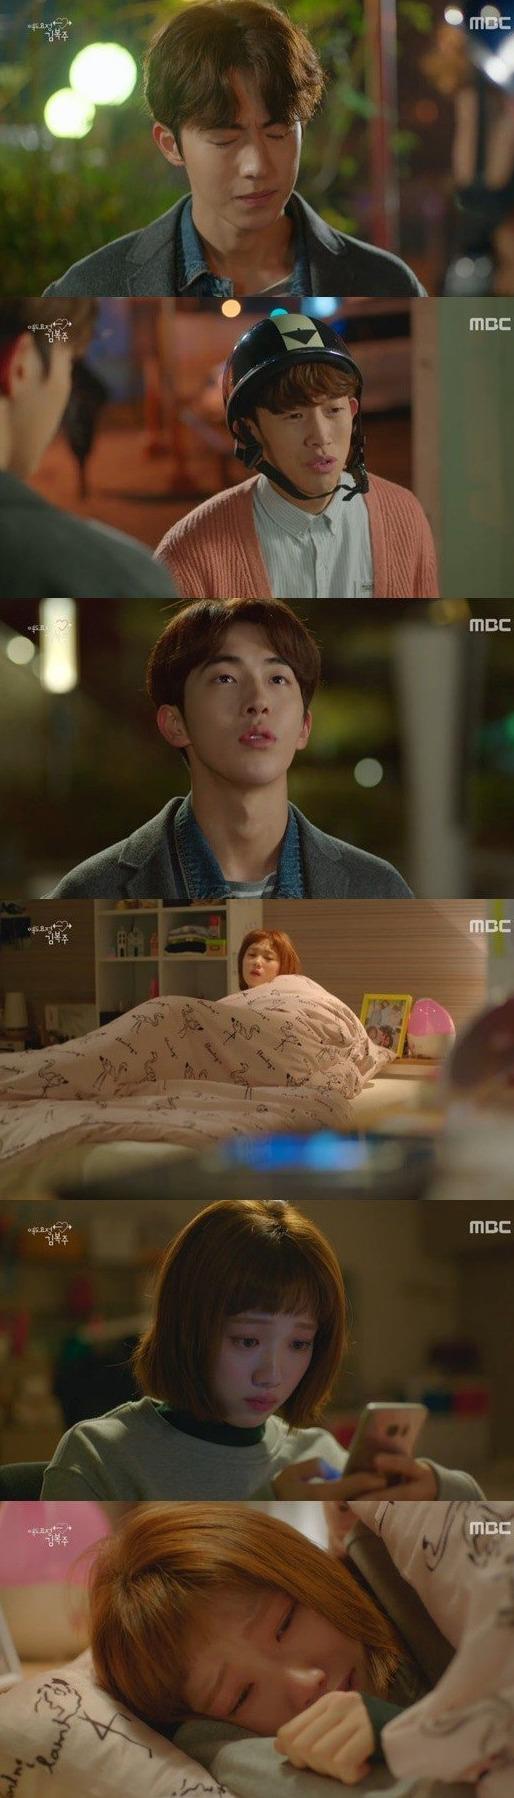 Risultati immagini per drama Weightlifting Fairy Kim Bok Joo mbc ep 07